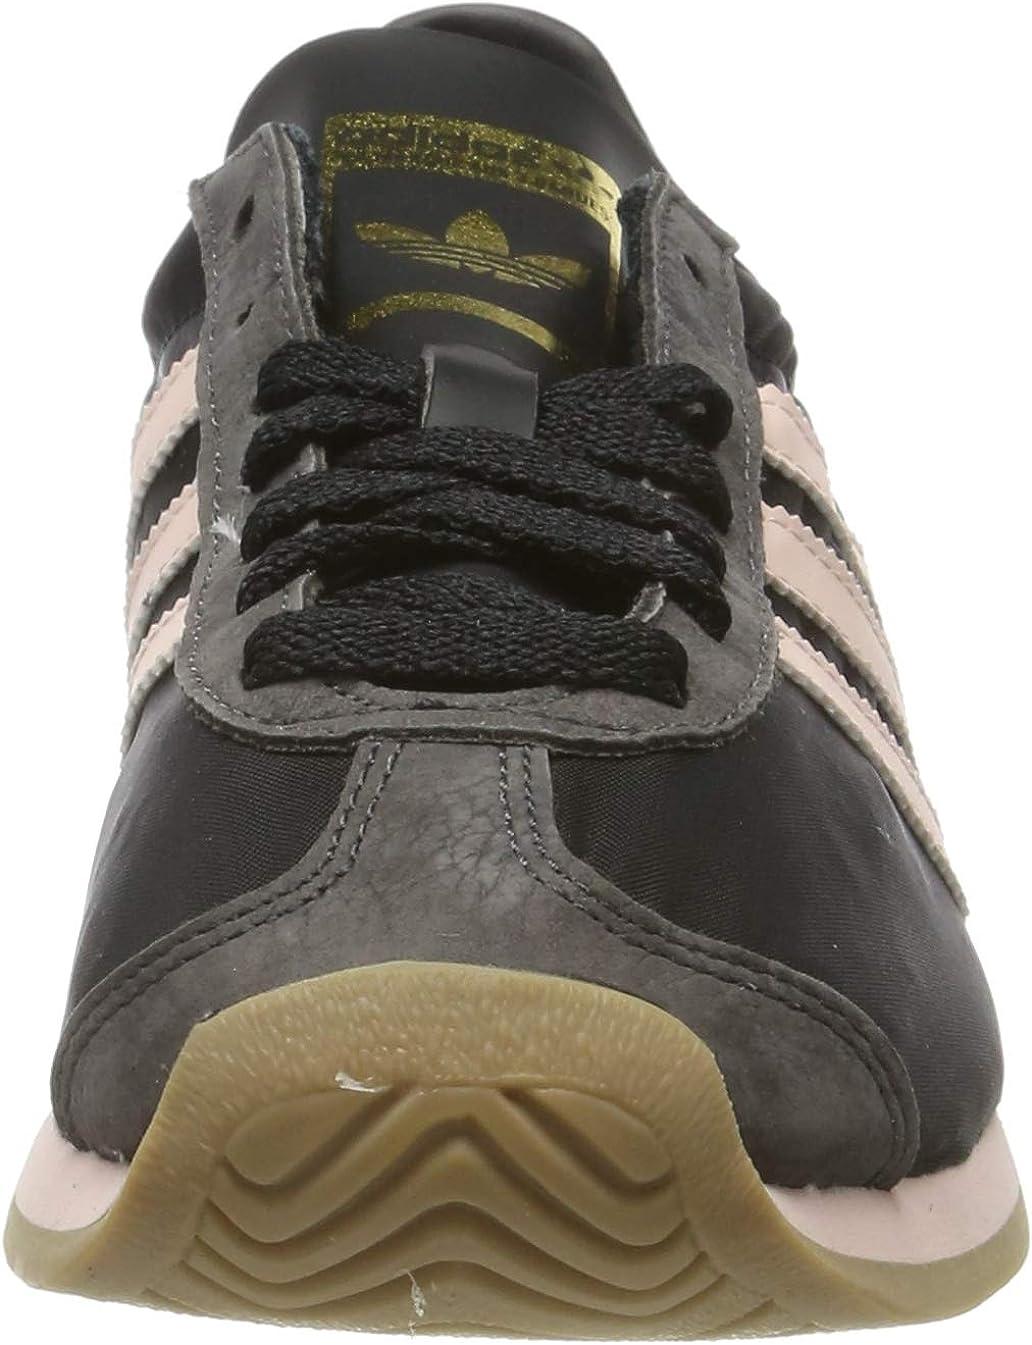 Adidas Country OG Zapatillas de Deporte Mujer Negro Negbasrosg 5muqP